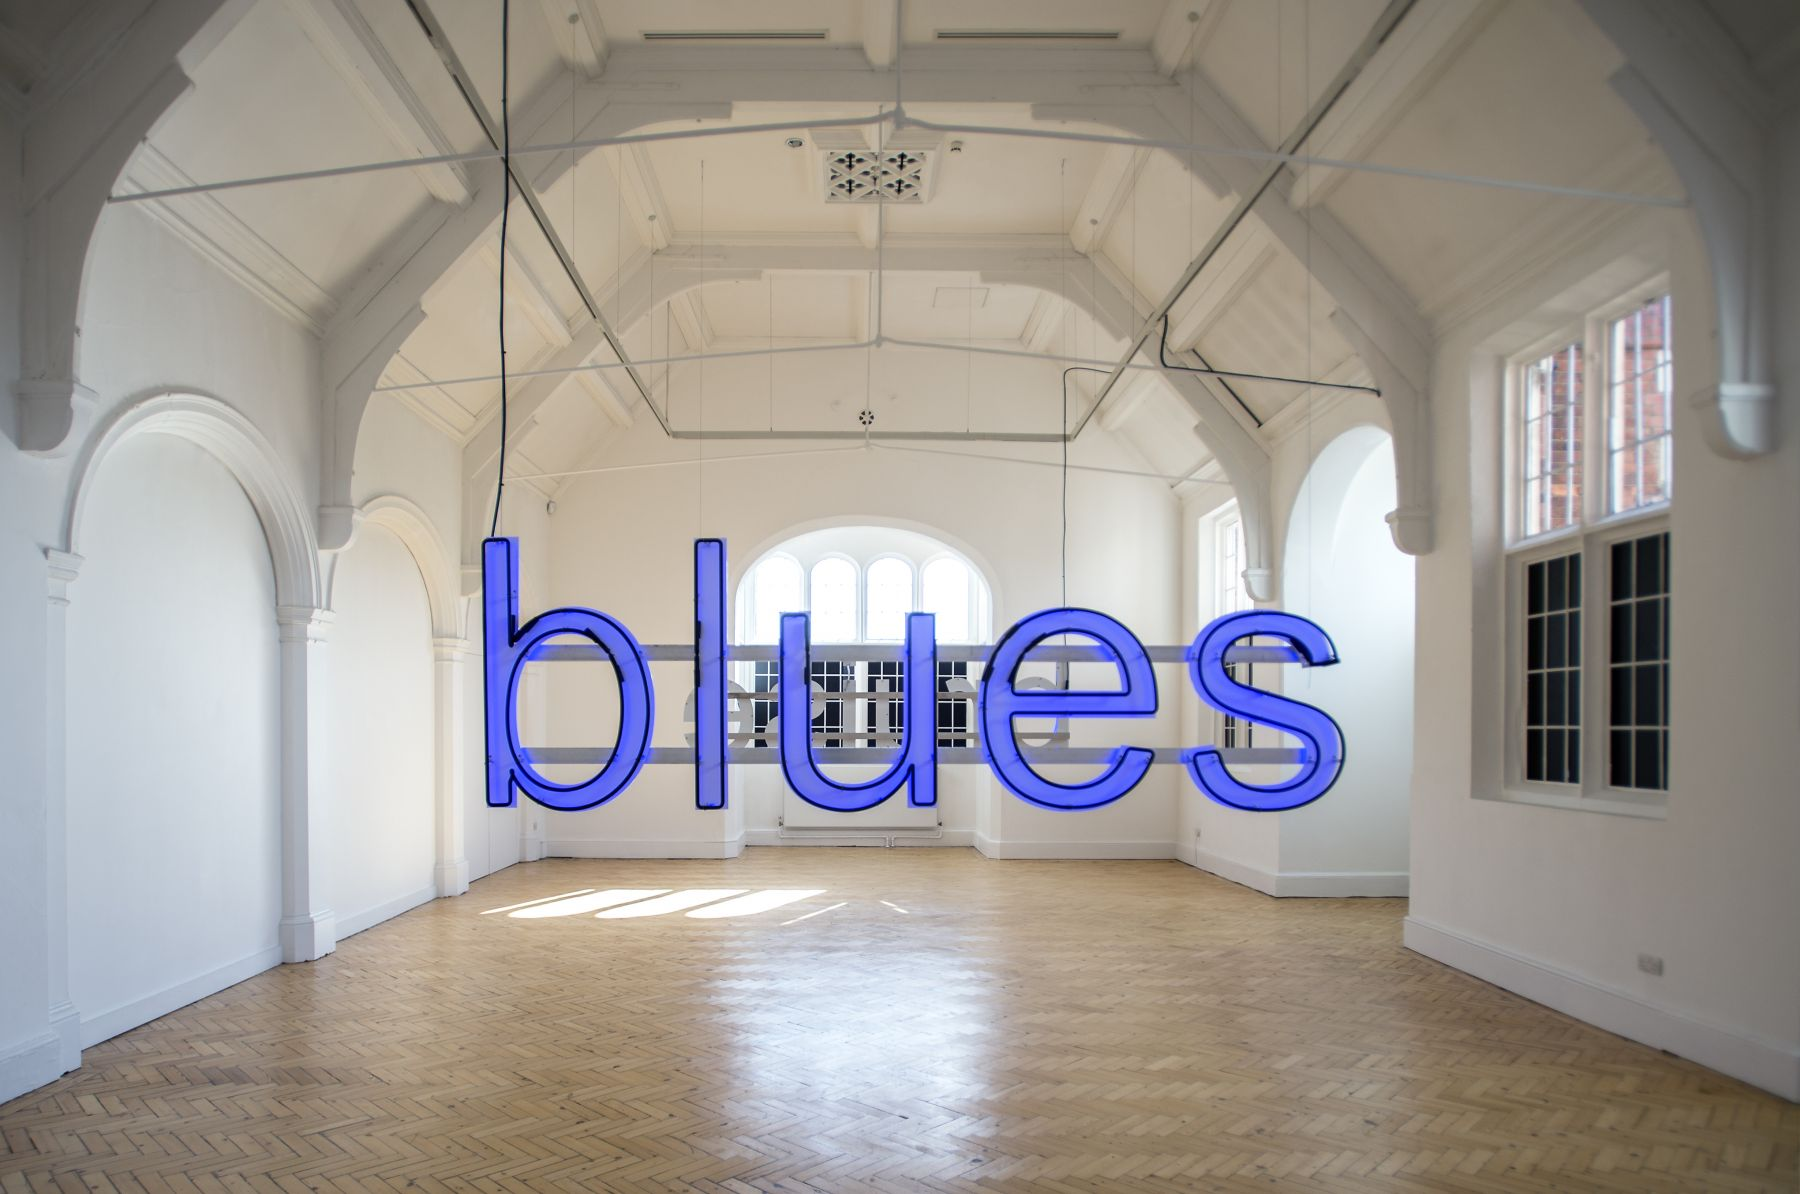 Glenn Ligon, Camden Arts Center